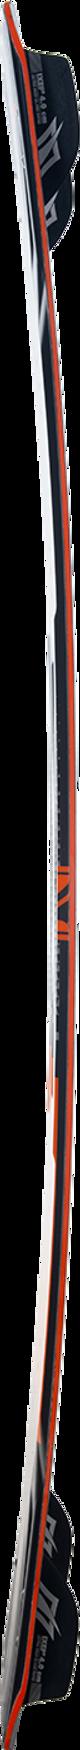 2020 Naish Monarch Kiteboard